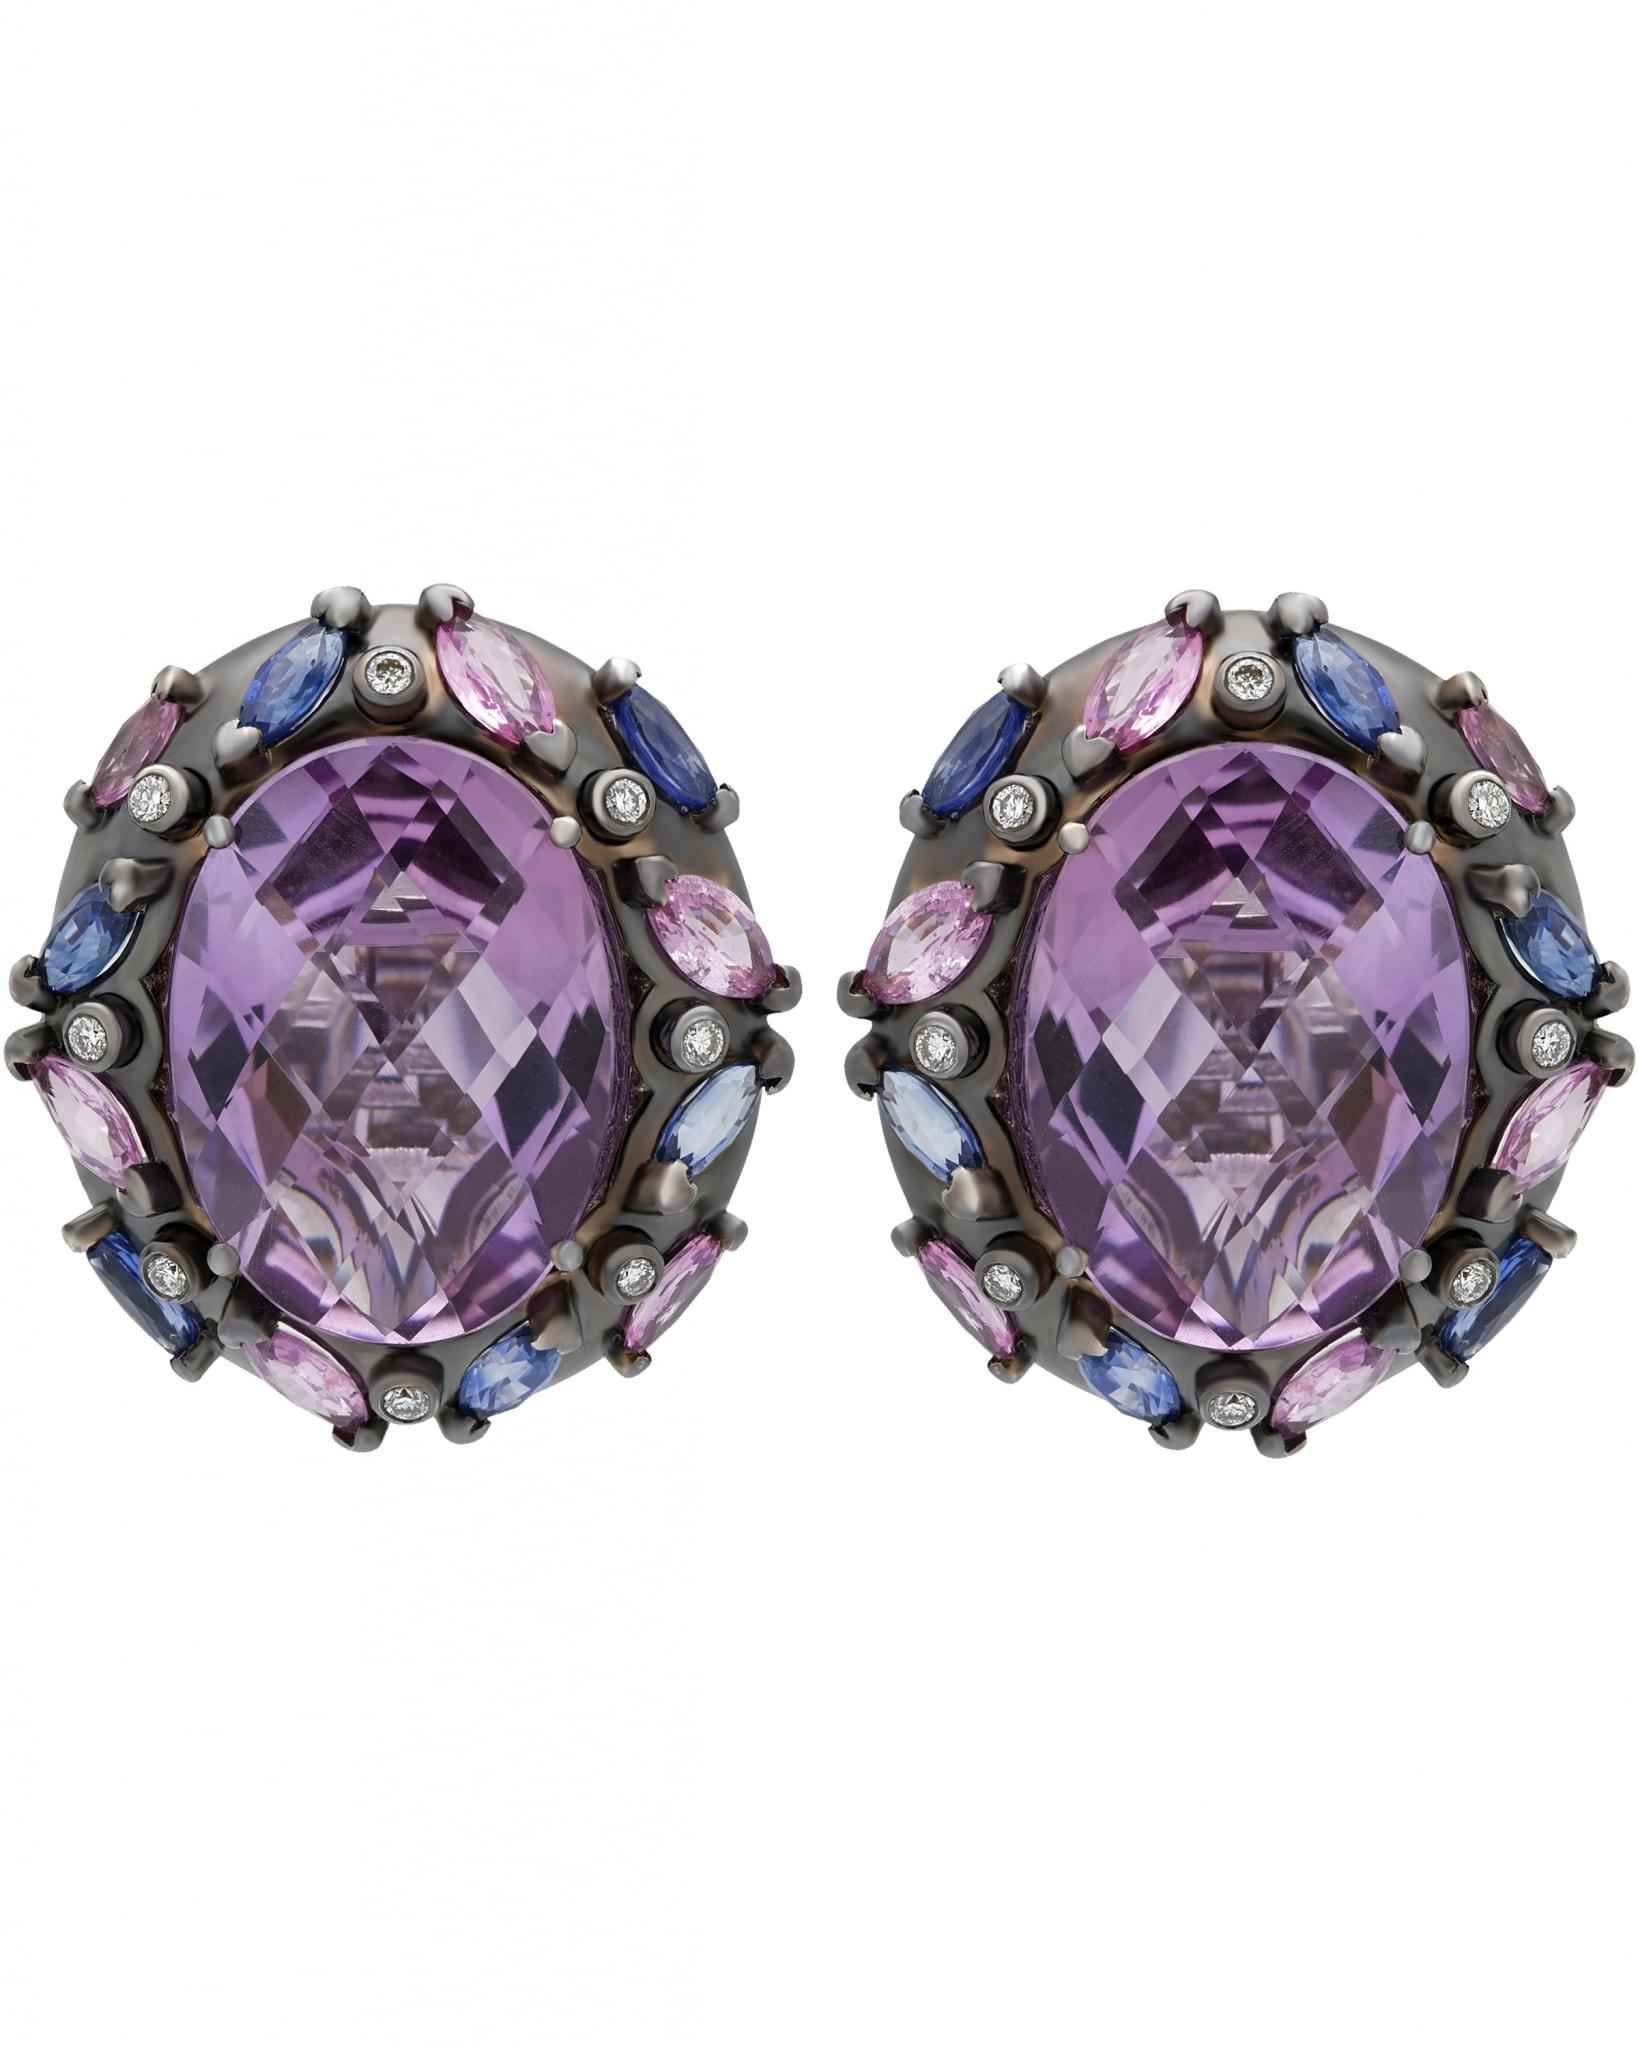 GIANNI LAZZARO – 'Mangurian' 18K White Gold, Diamonds, Blue and Pink Sapphires, & Amethysts, Earrings